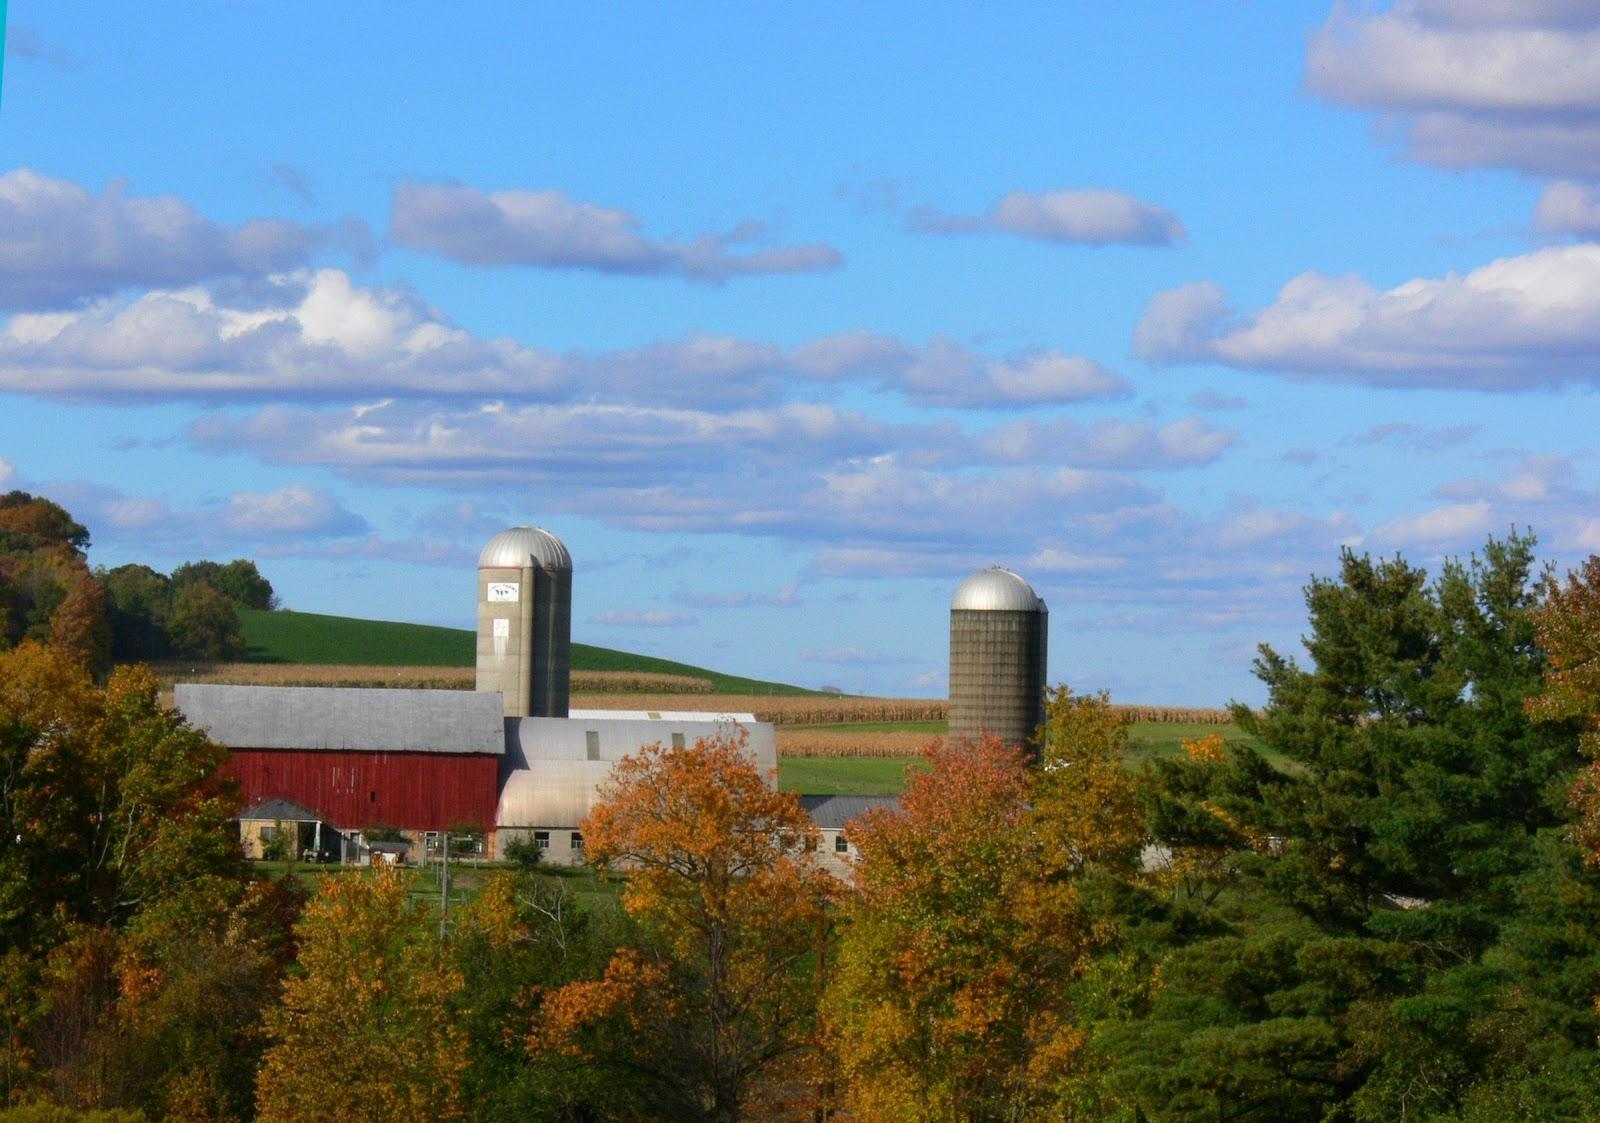 scenes hd wallpapers autumn wallpaper by emats farm autumn scene 1600x1123